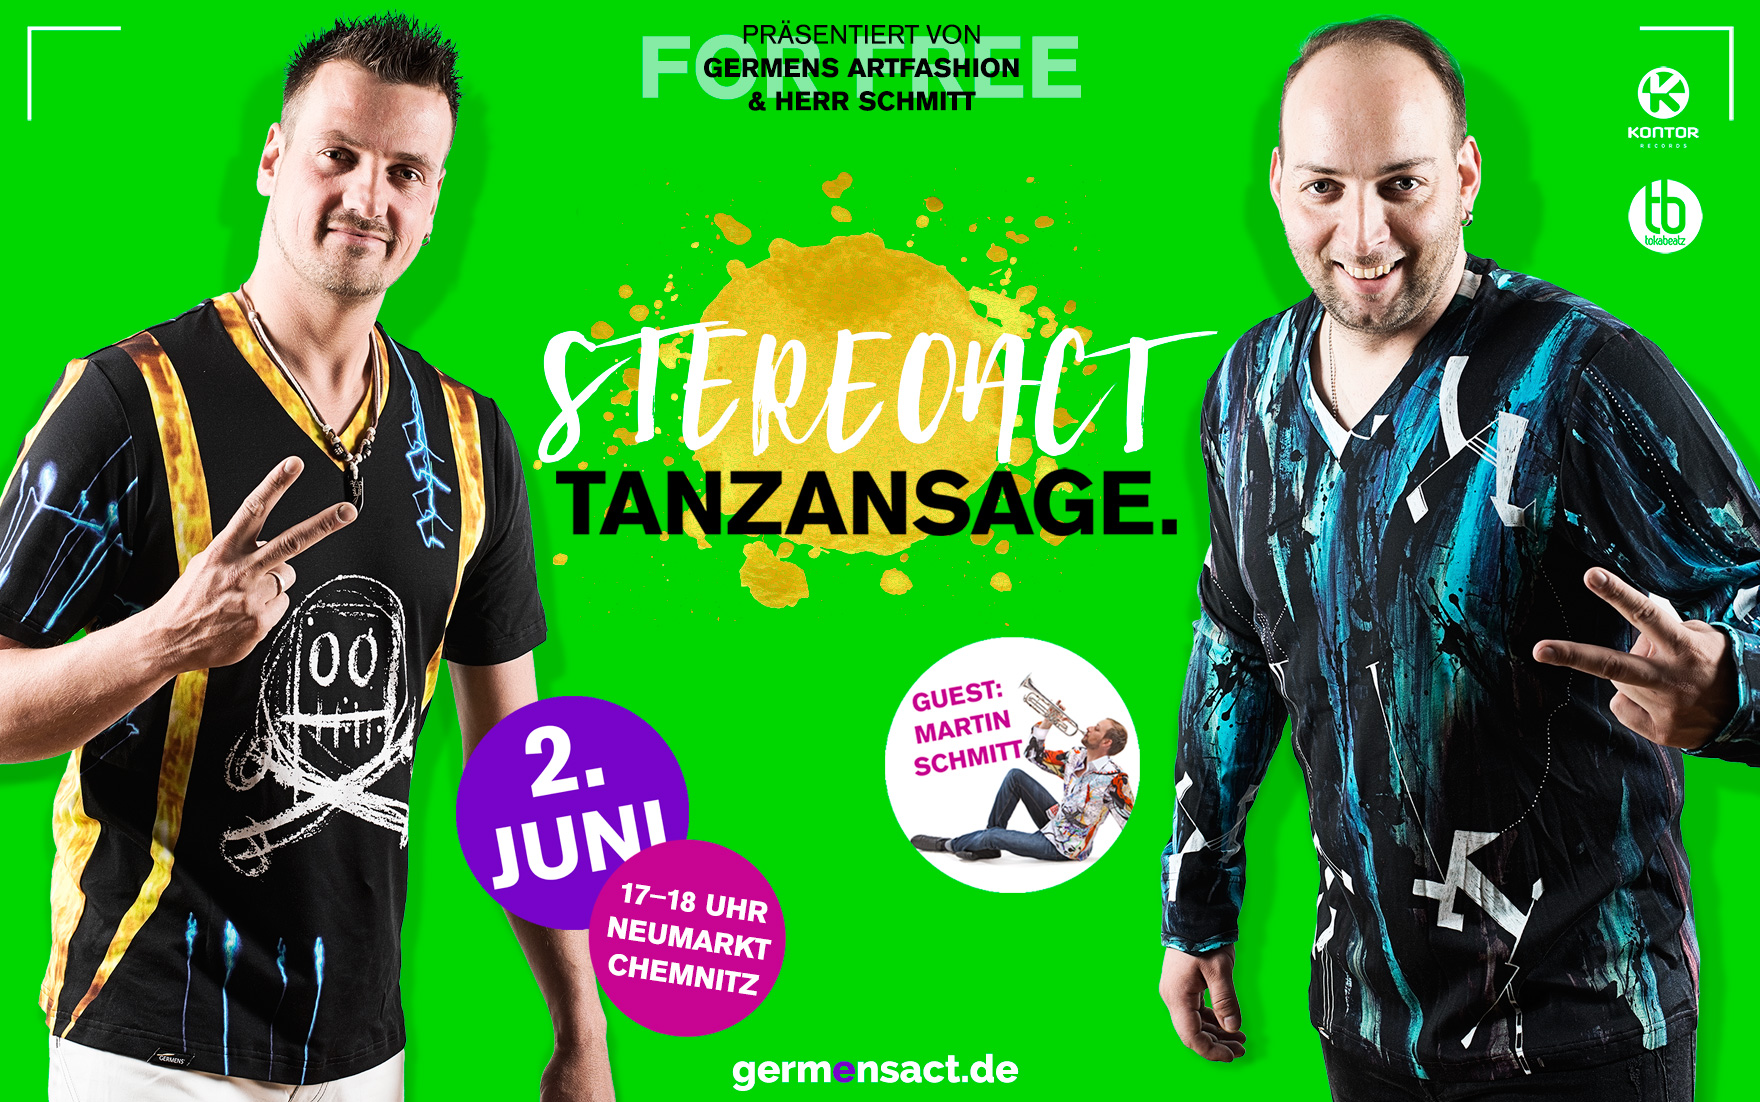 Stereoact live in Chemnitz Neumarkt am 2. Juni 2016